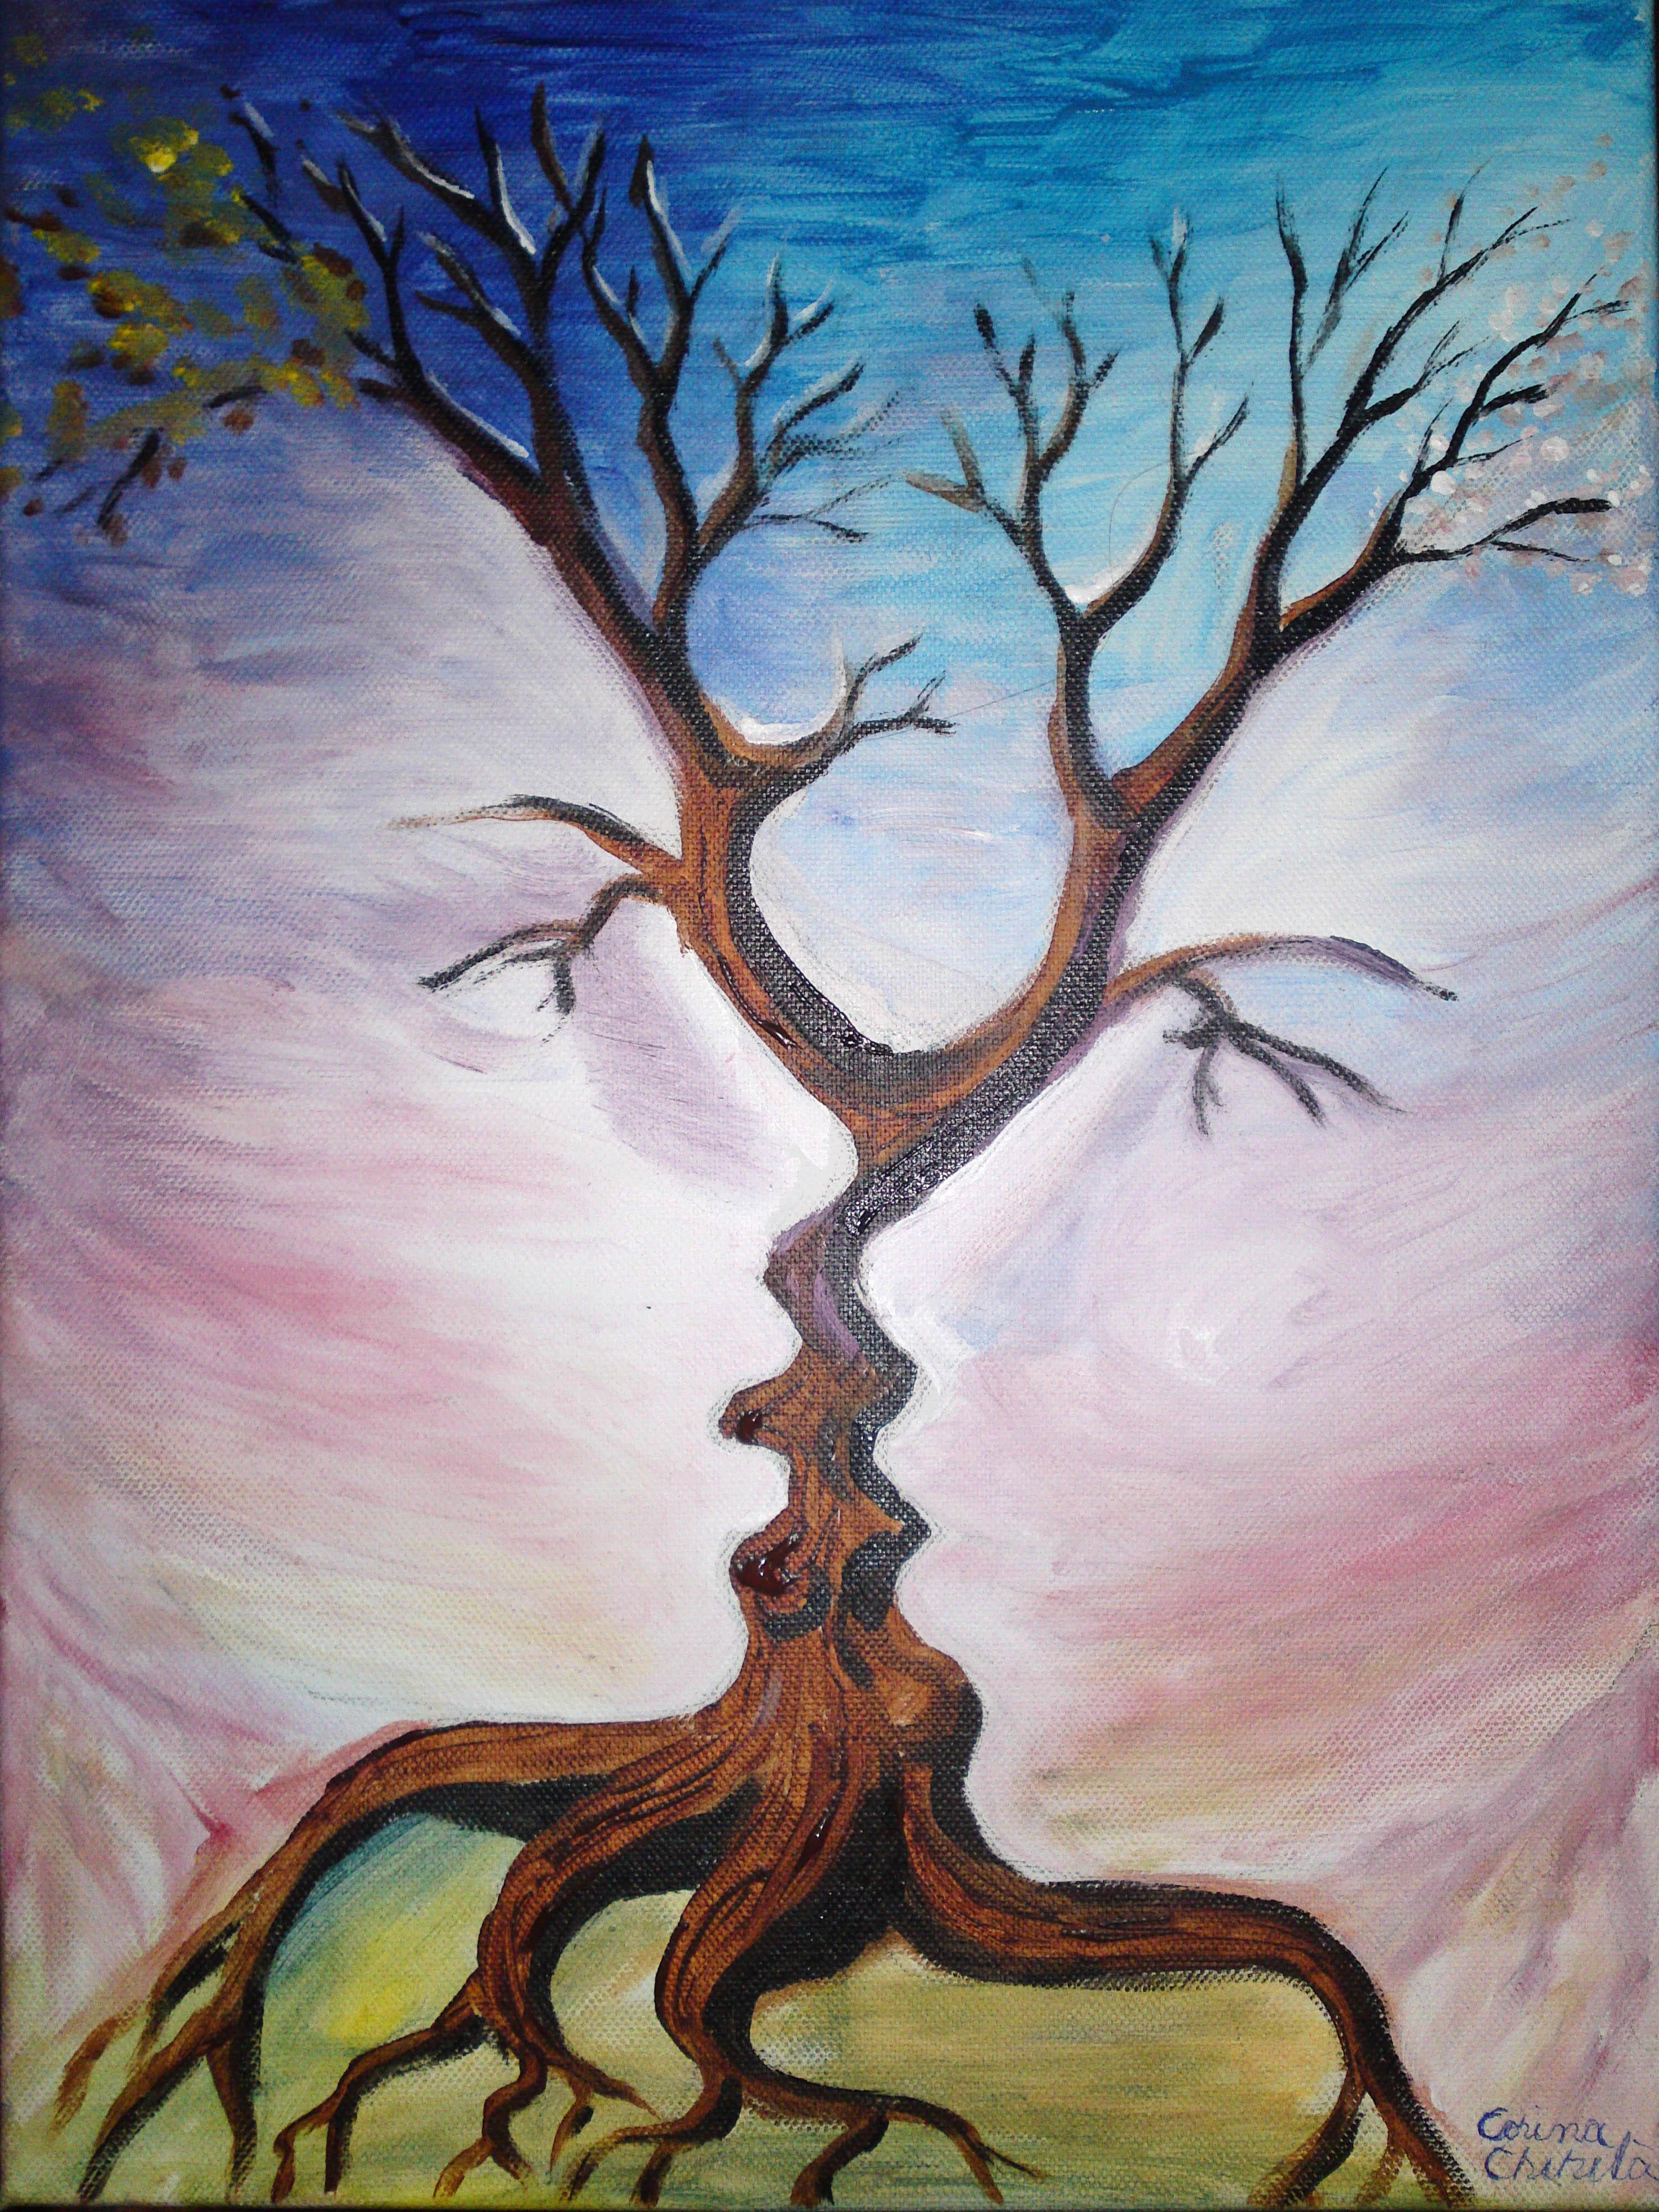 Acrylics on canvas painting korinna 39 s universe for How to make a canvas for acrylic painting